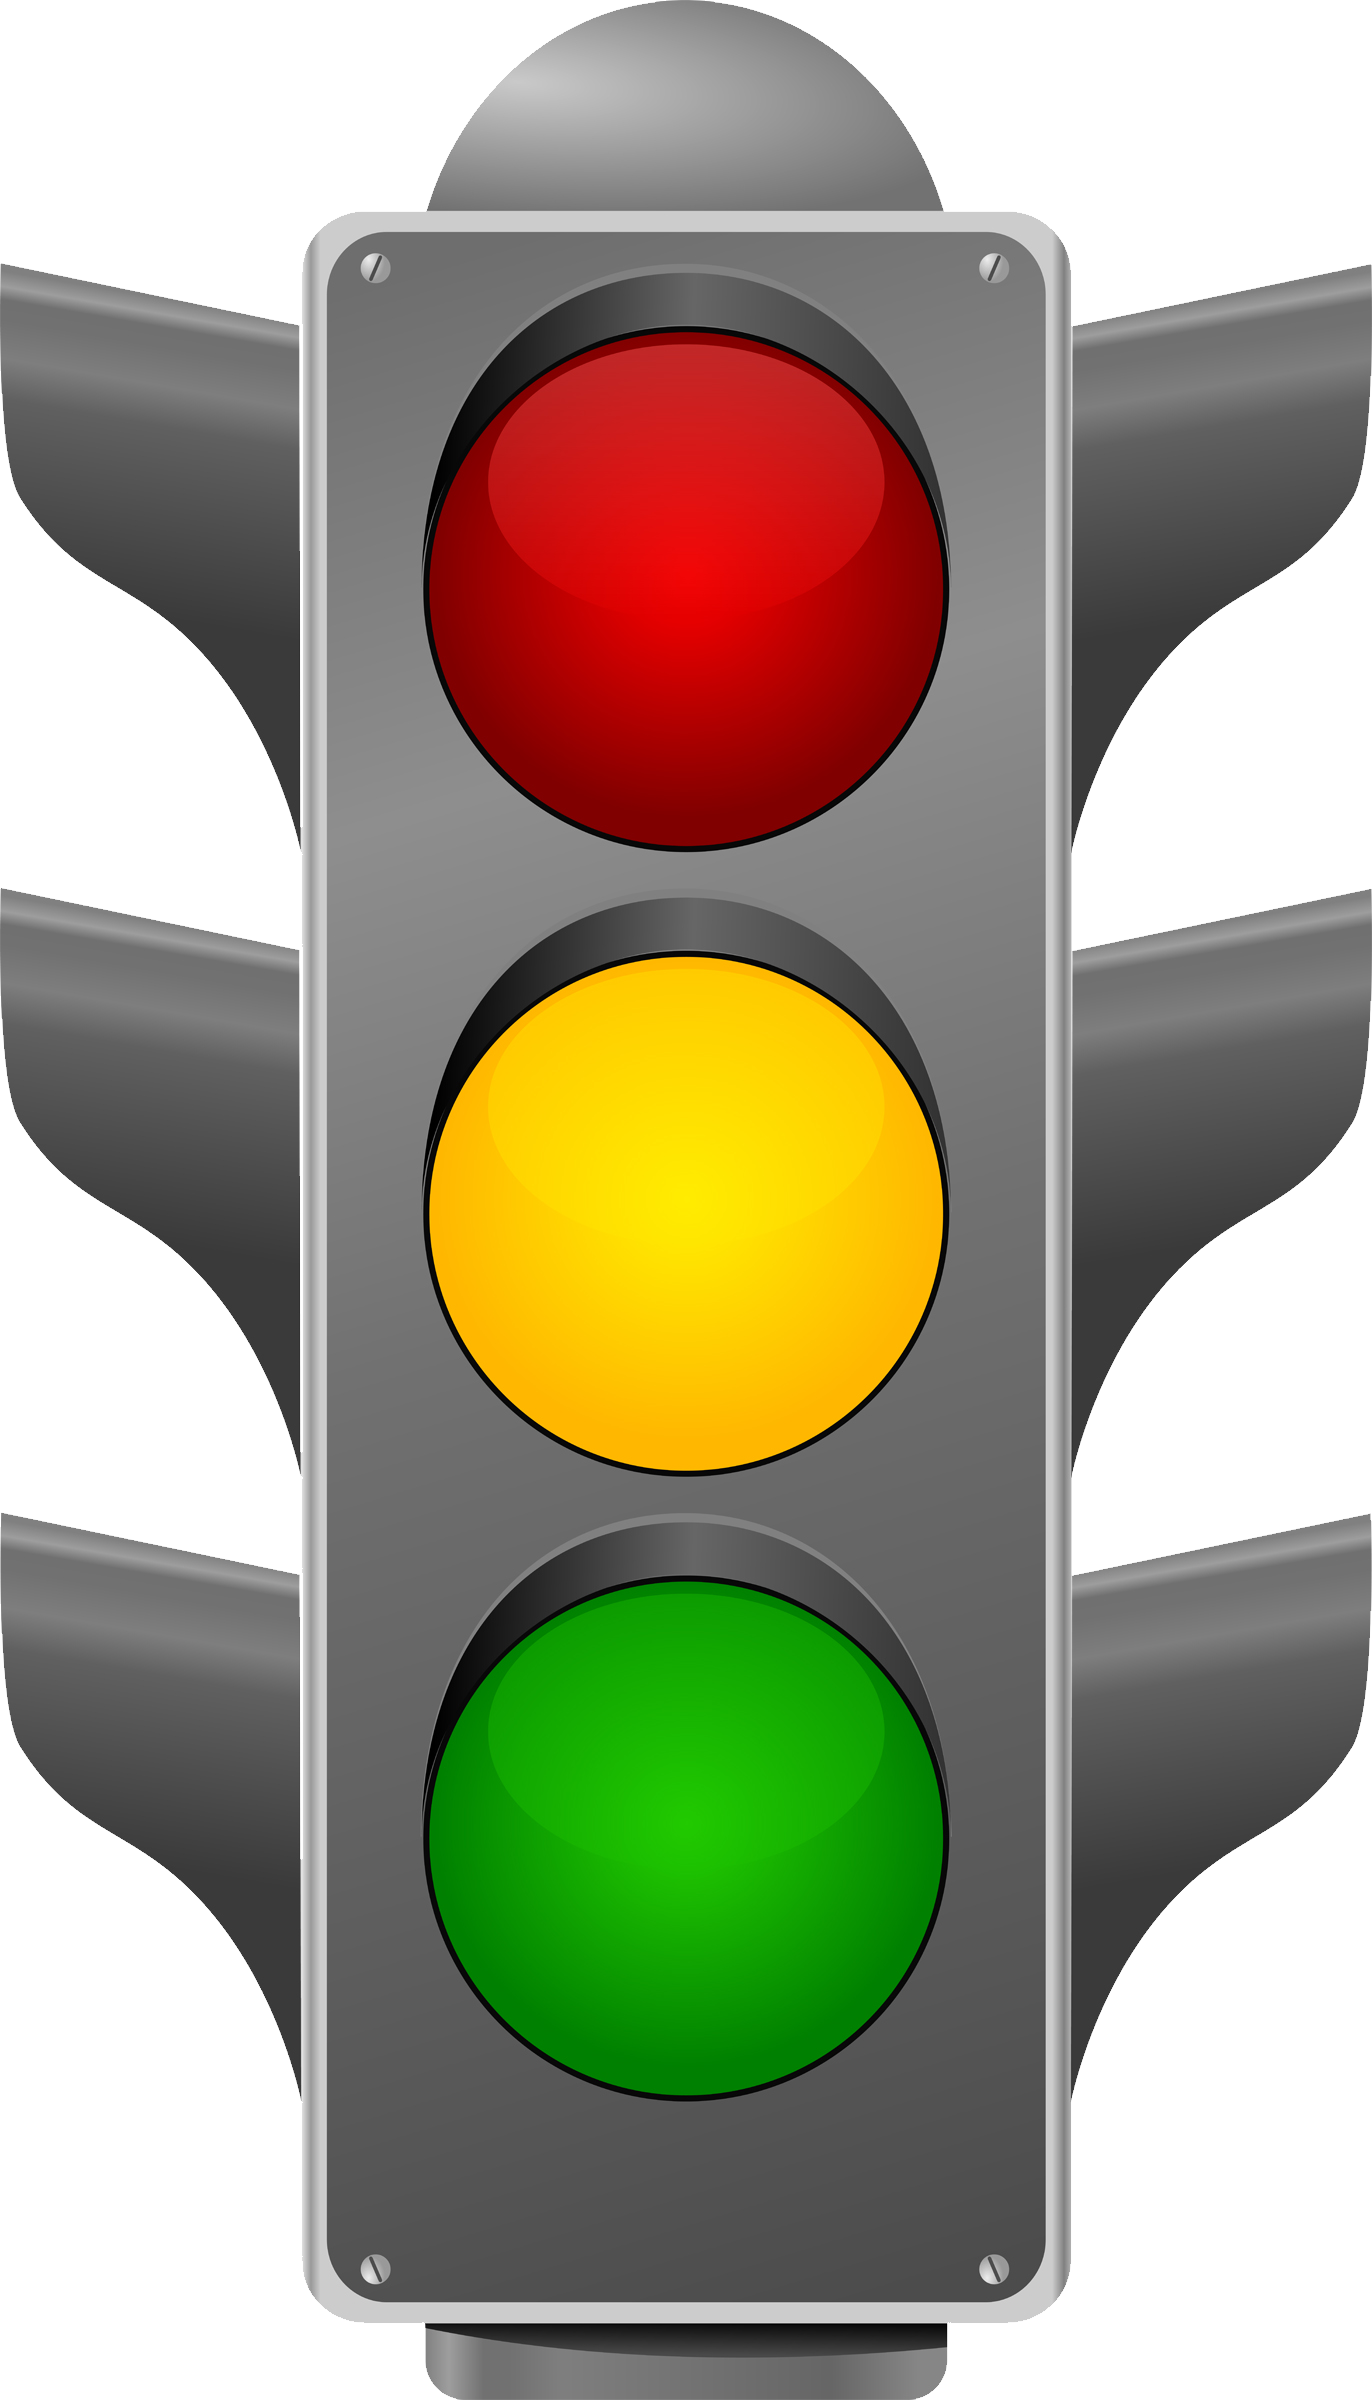 Traffic Light Png - Traffic Light, Transparent background PNG HD thumbnail